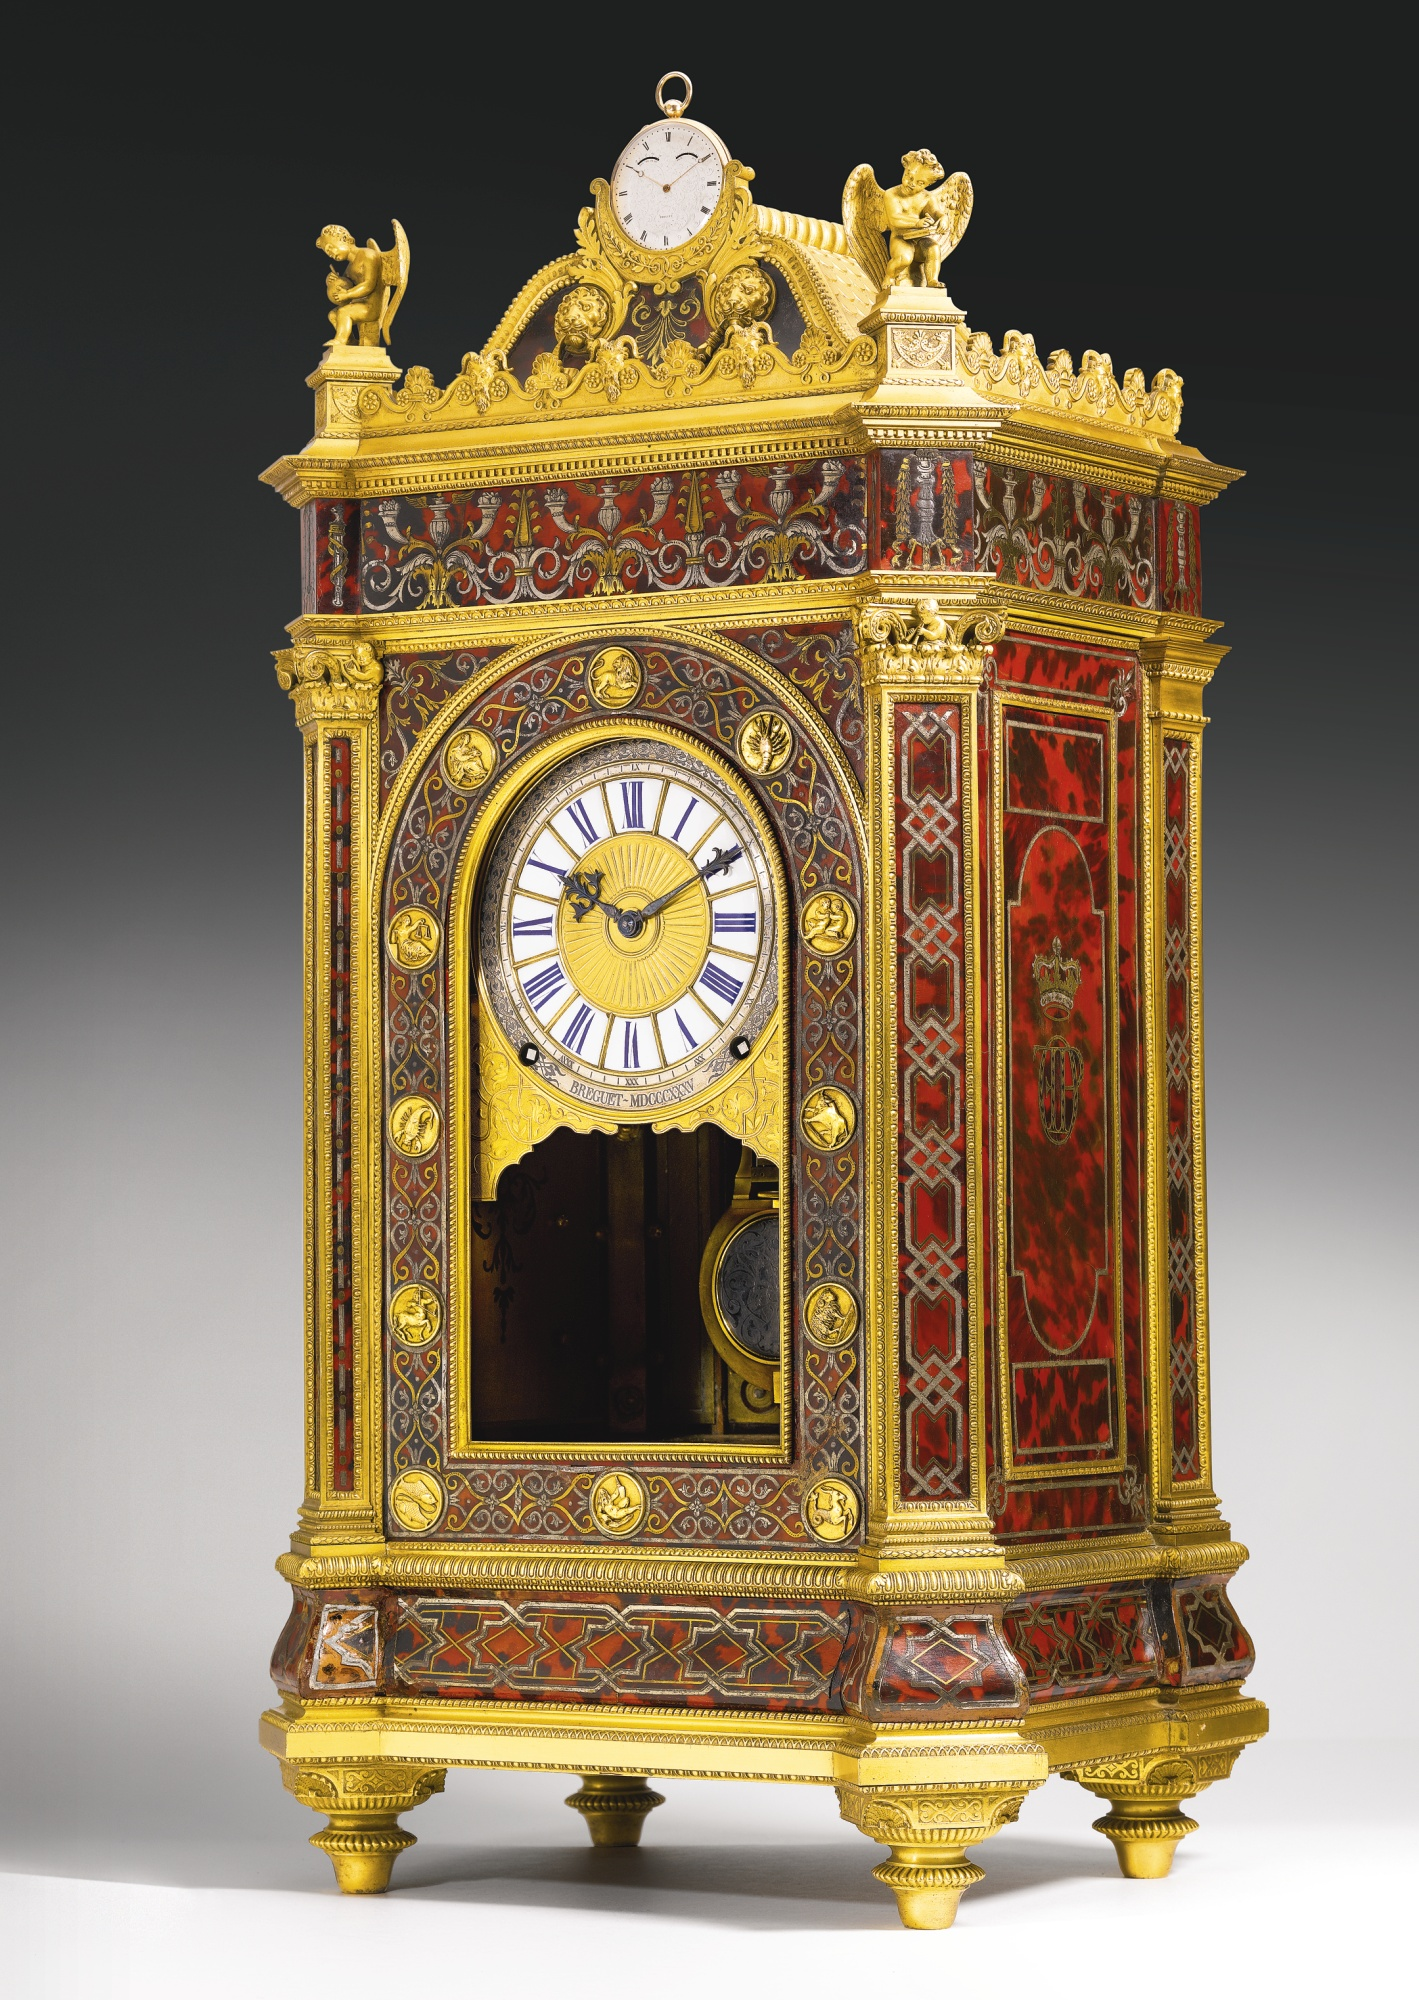 La Pendola Simpatetica del Duca D'Orléan, battuta all'asta da Sothebys per la cifra record di 6,802,500 USD